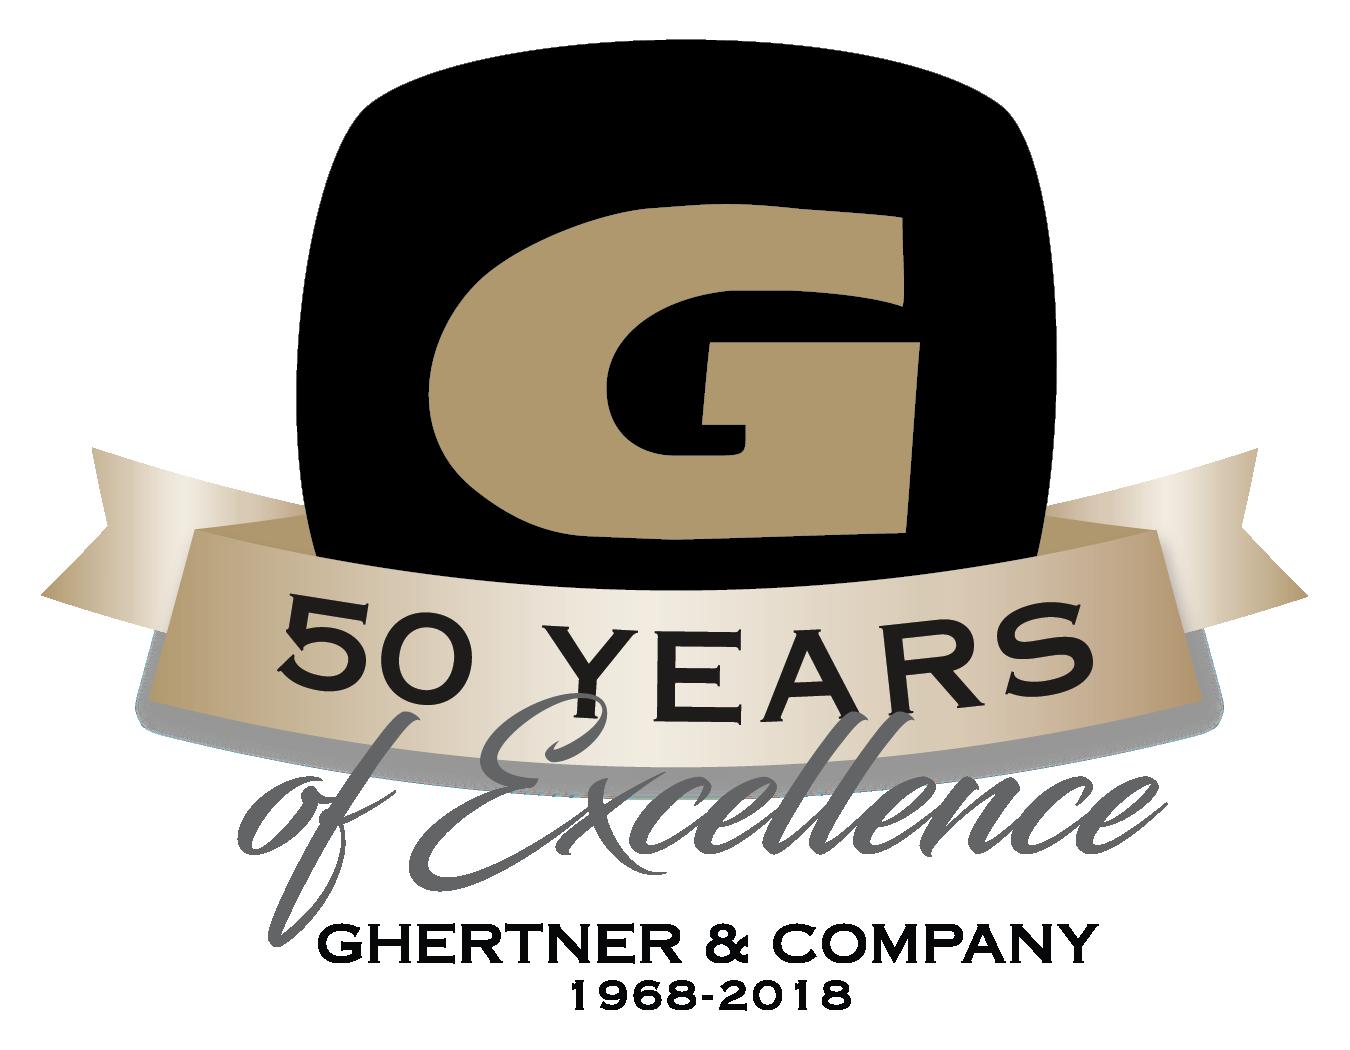 Clipart key property management. Ghertner company